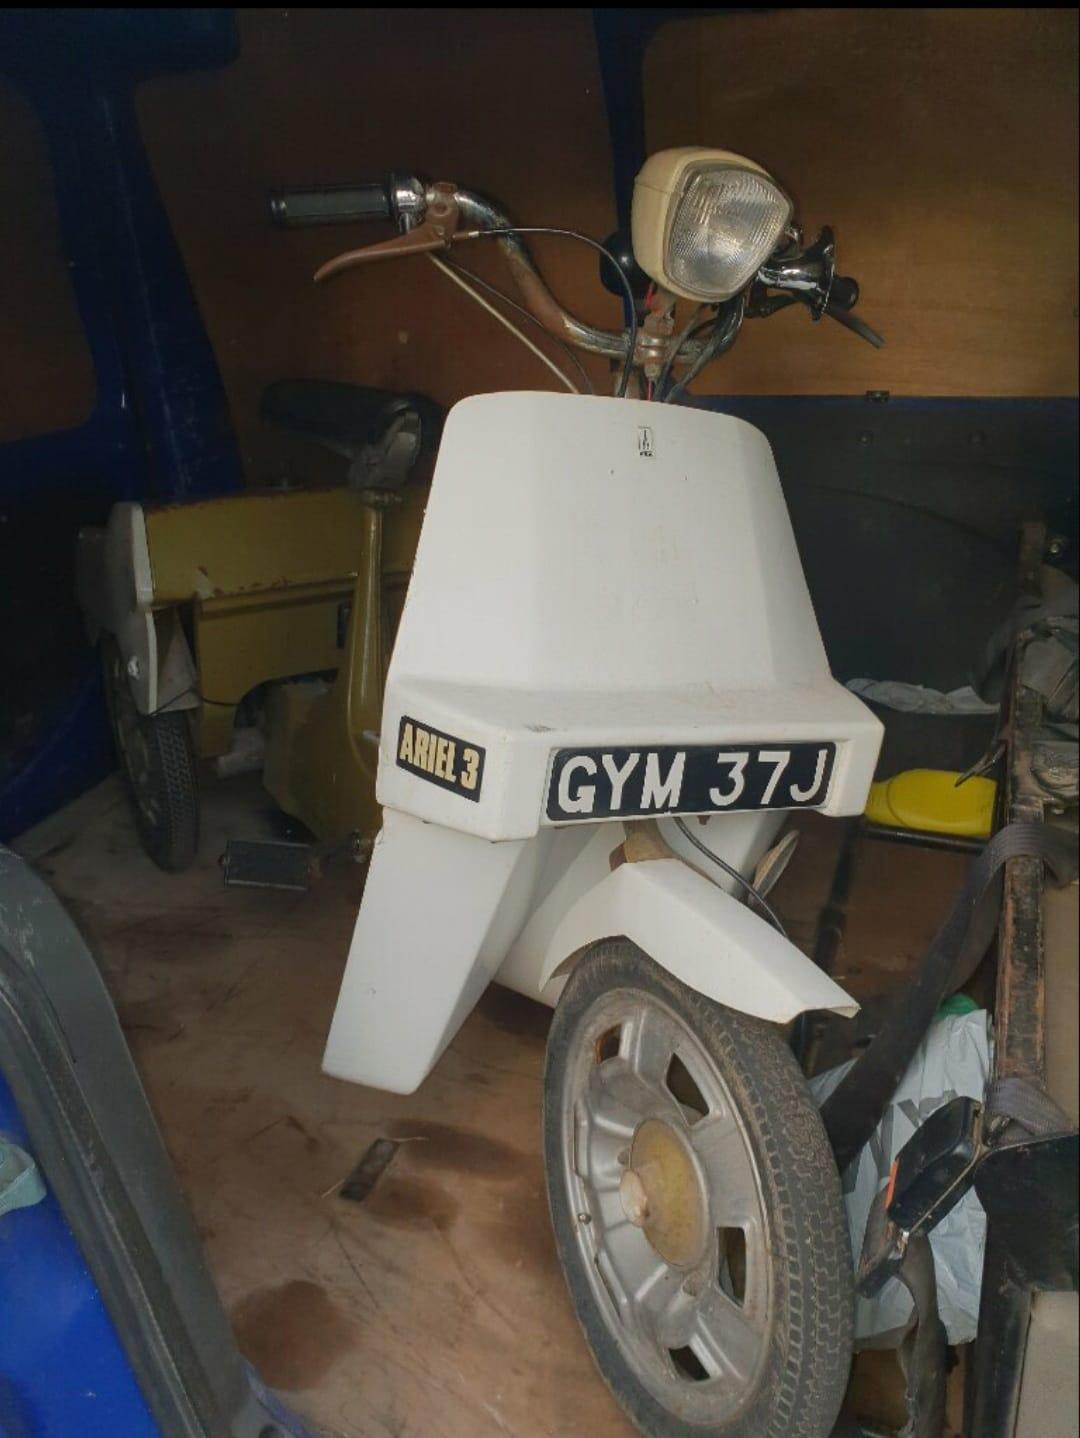 GYM 37 J